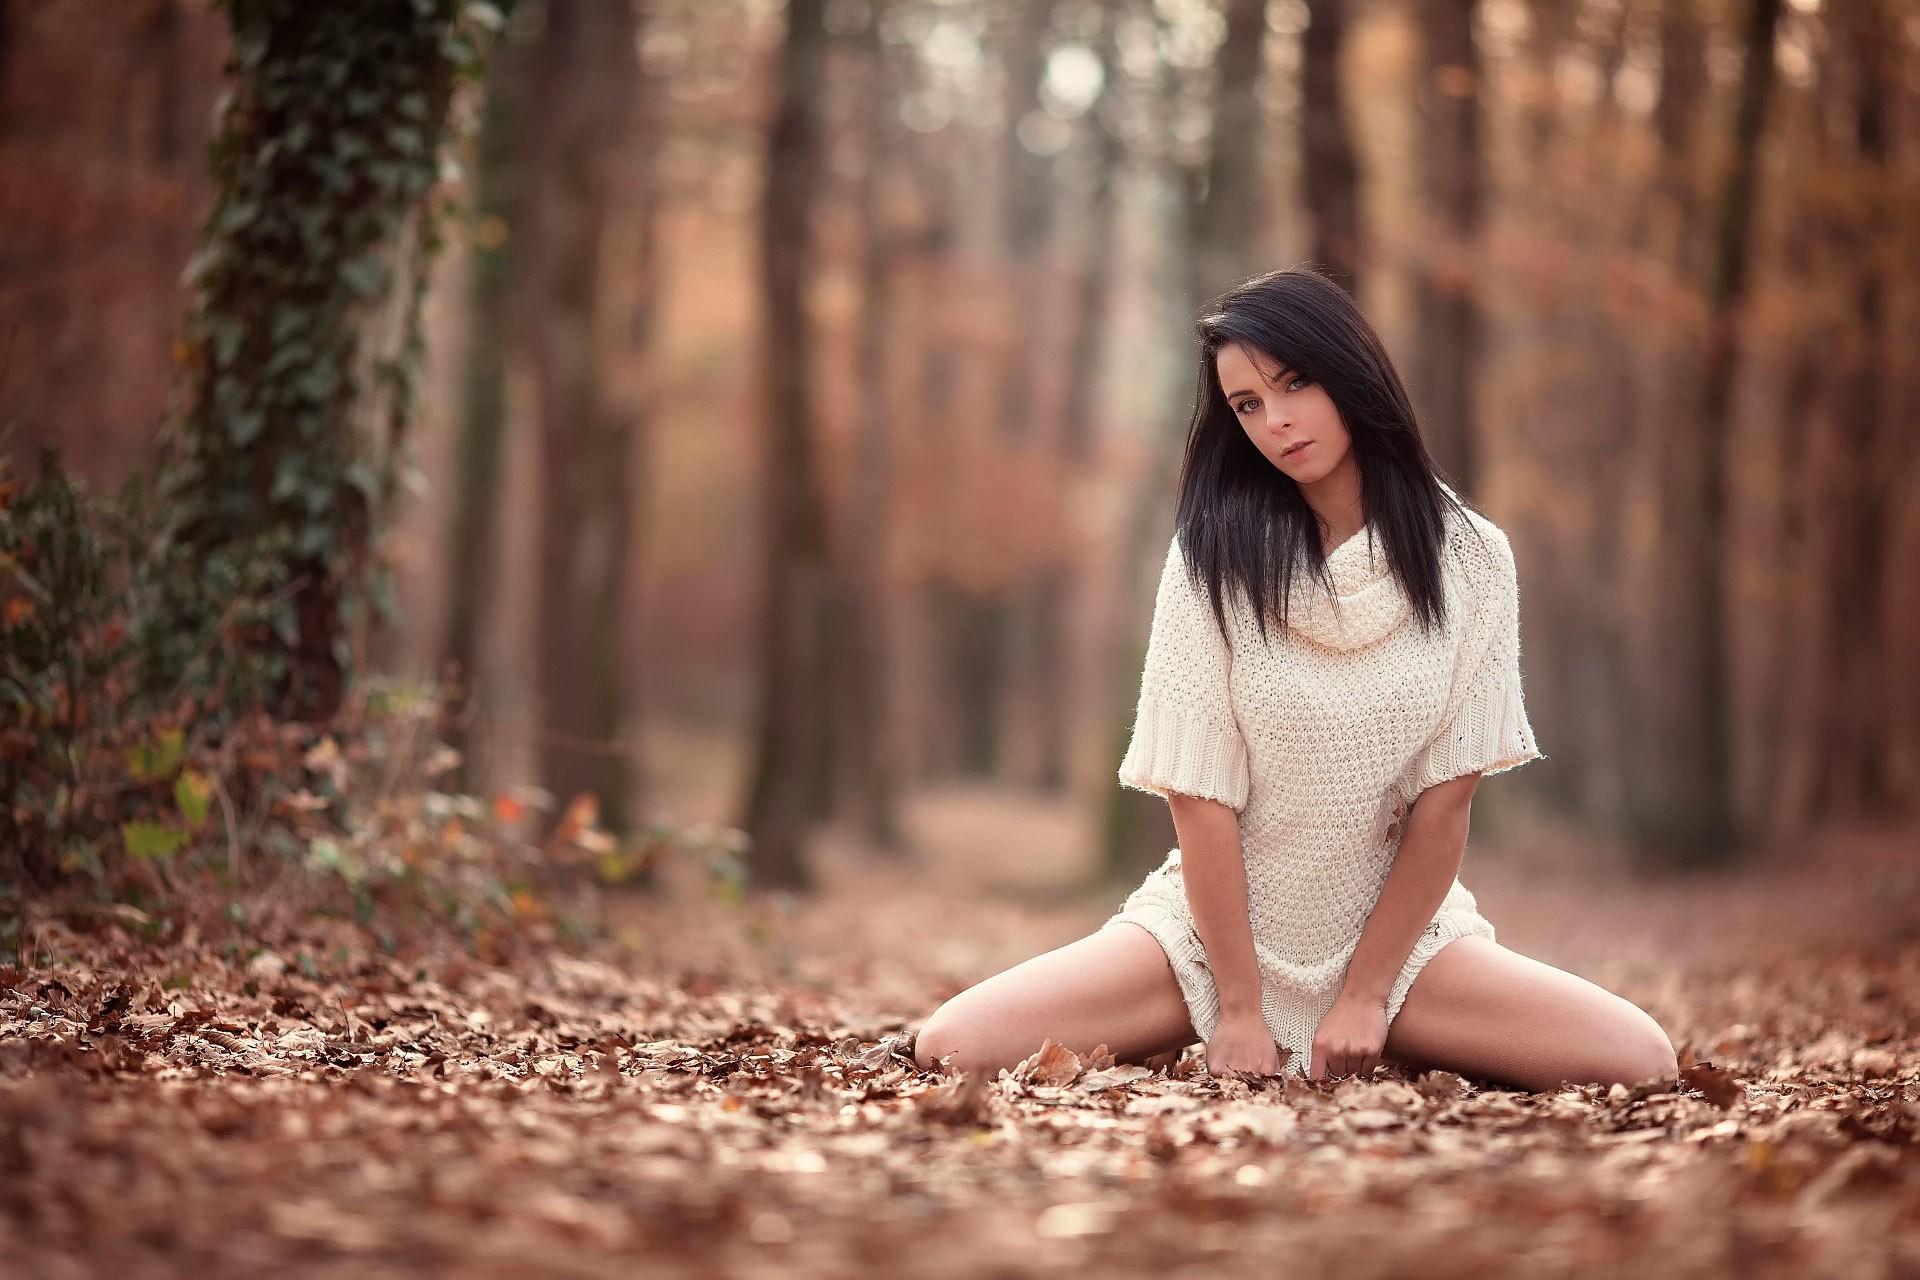 People 1920x1280 women brunette Laurent Kacé white dress women outdoors spread legs looking at viewer squatting